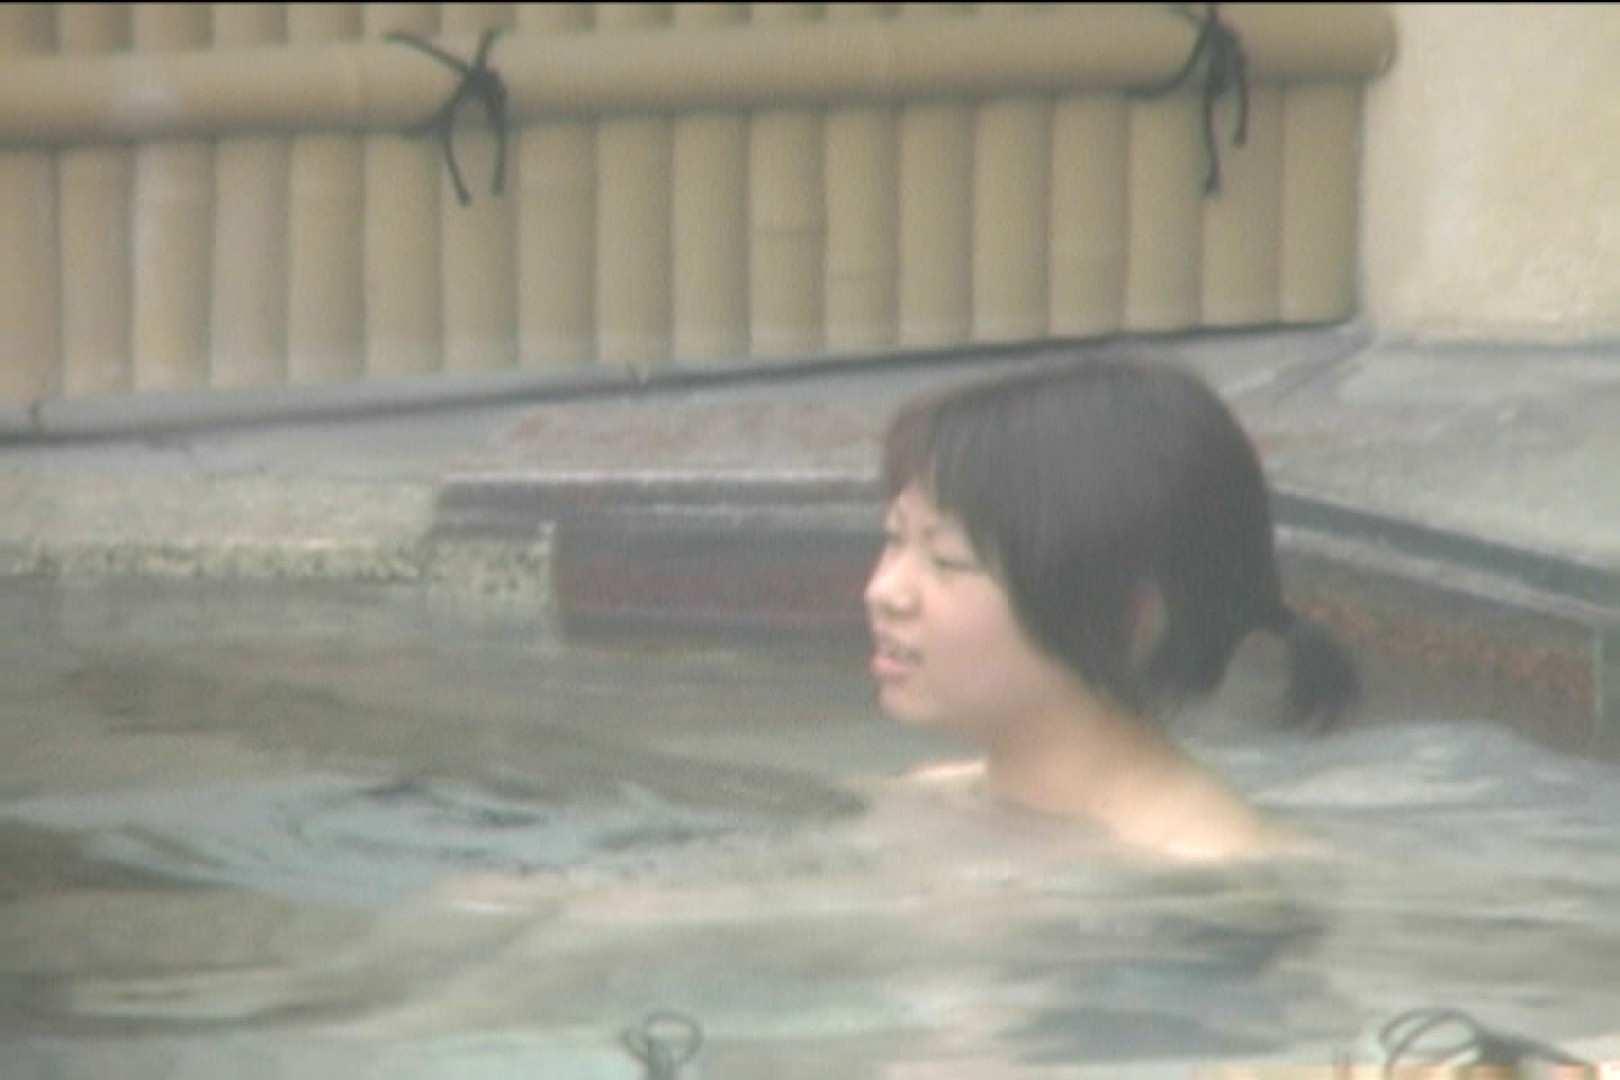 Aquaな露天風呂Vol.141 盗撮   OLエロ画像  22PICs 10